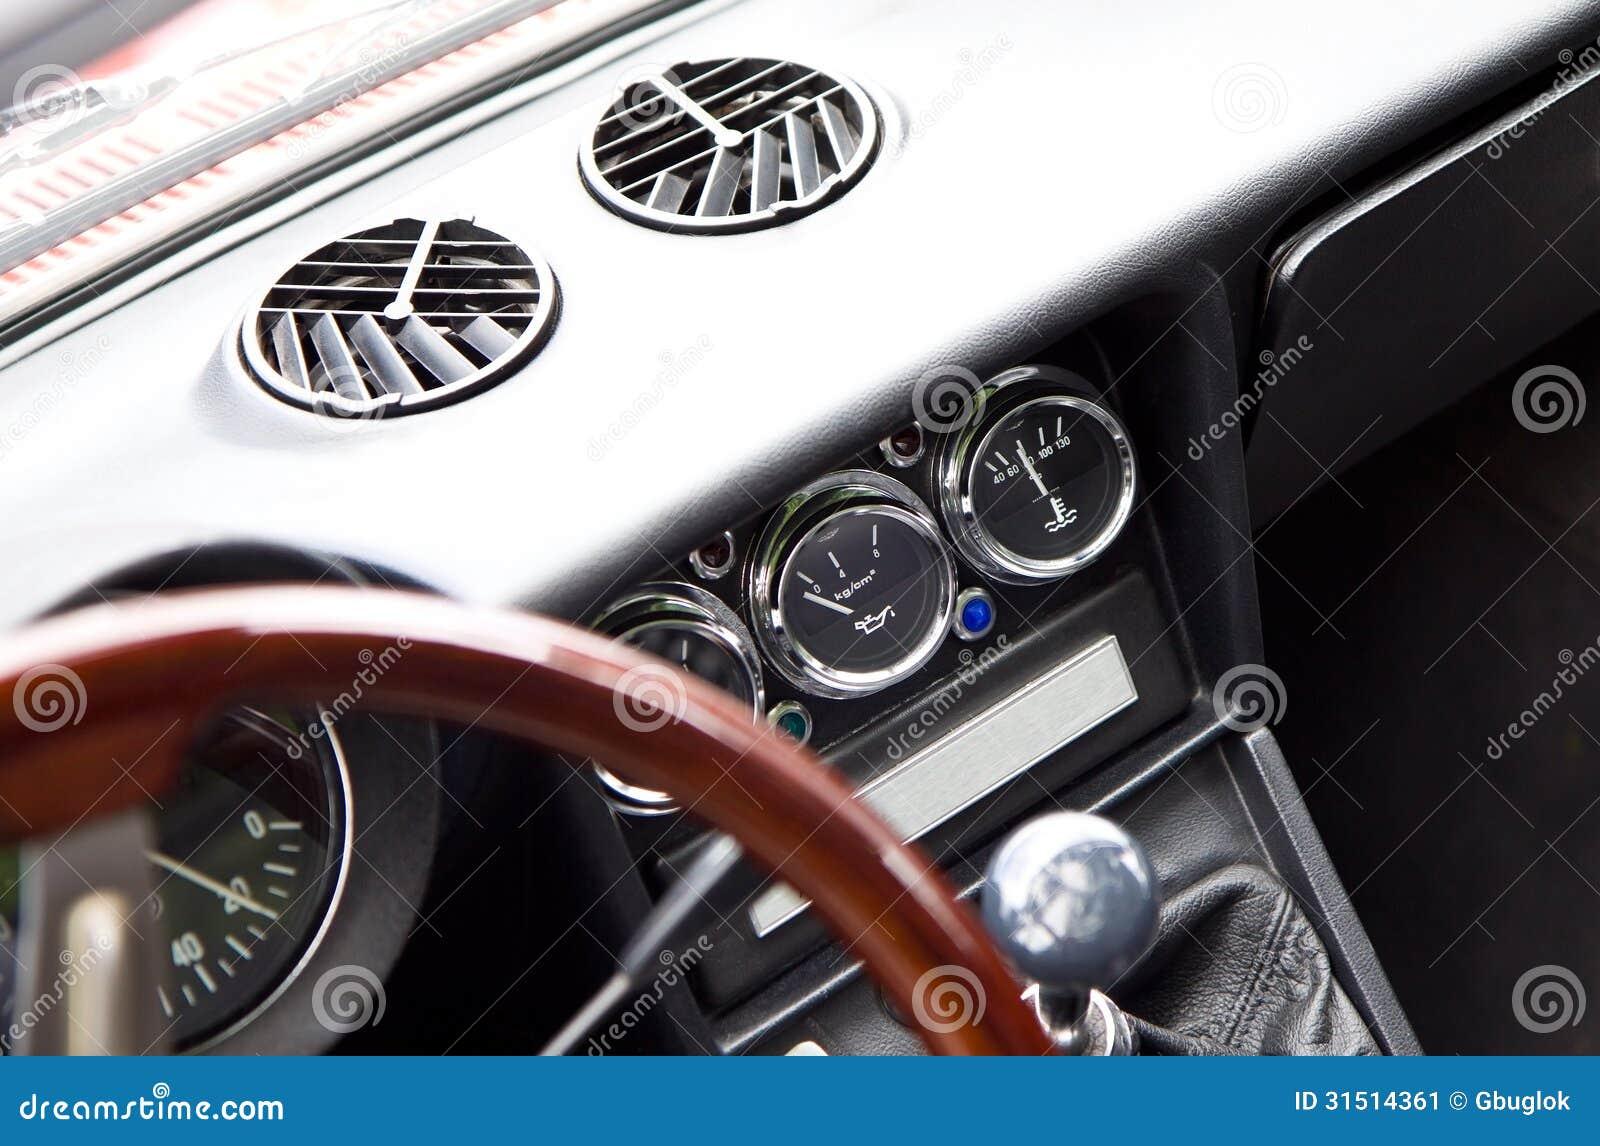 retro car interior stock image image 31514361. Black Bedroom Furniture Sets. Home Design Ideas